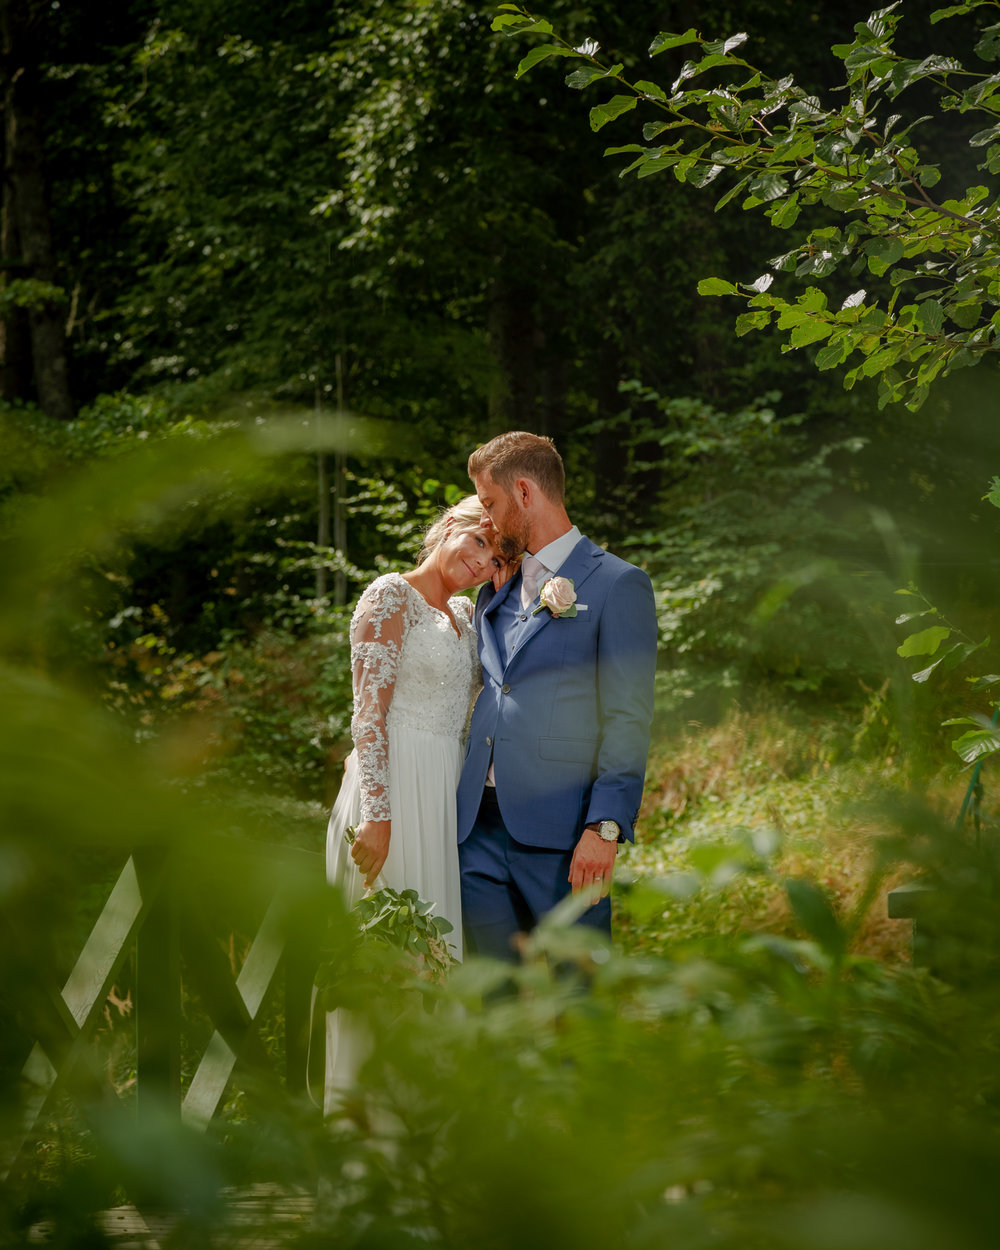 20180714-örebro-bröllop-331.jpg